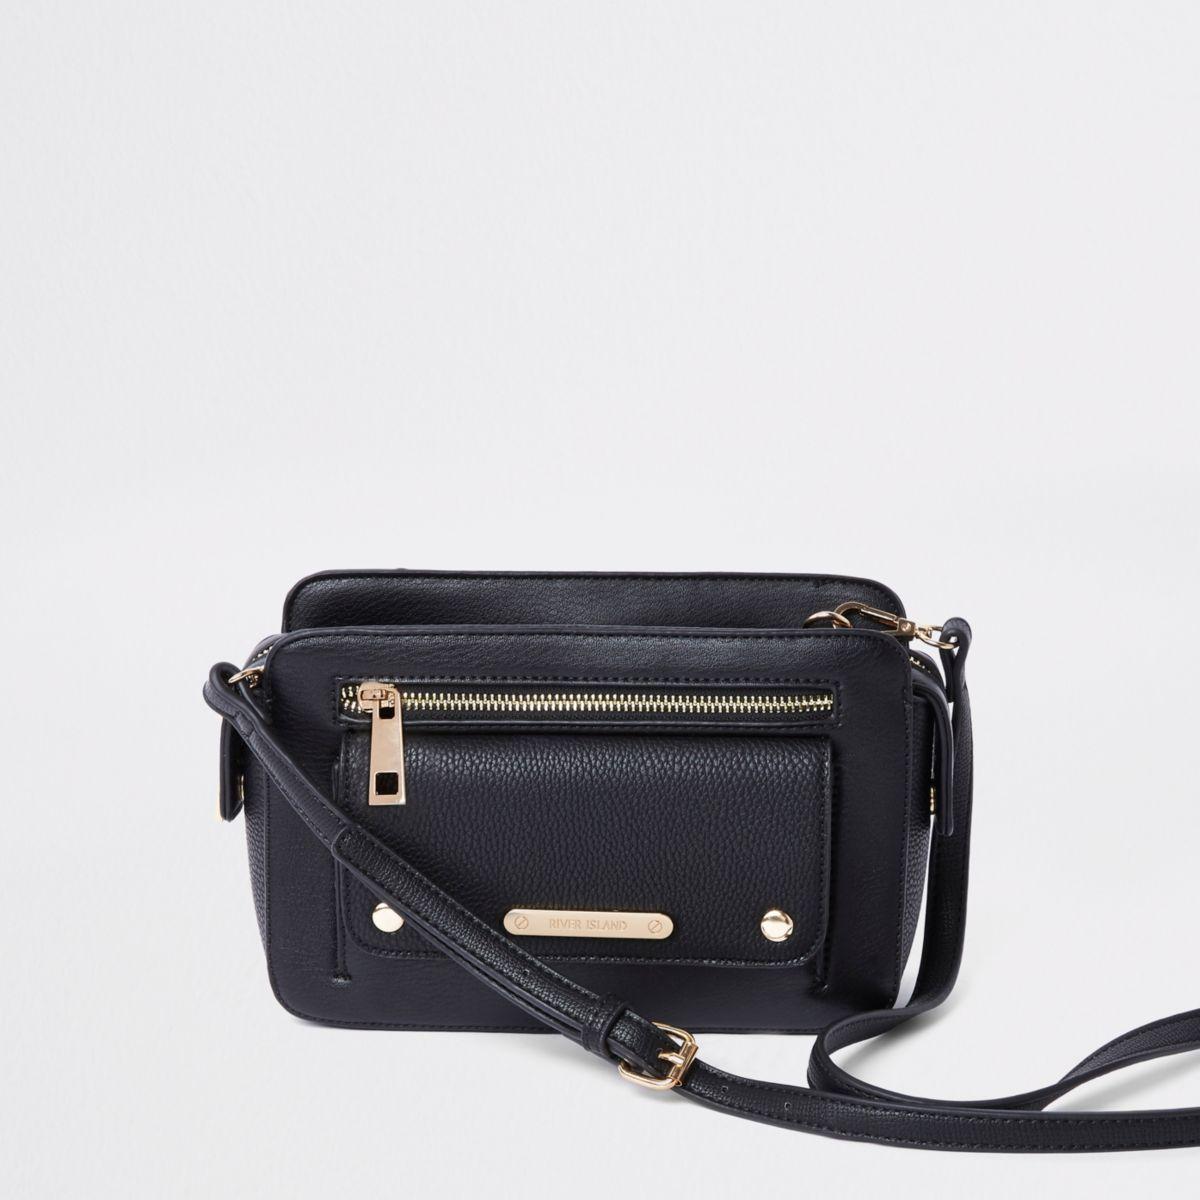 Black pocket front cross body bag